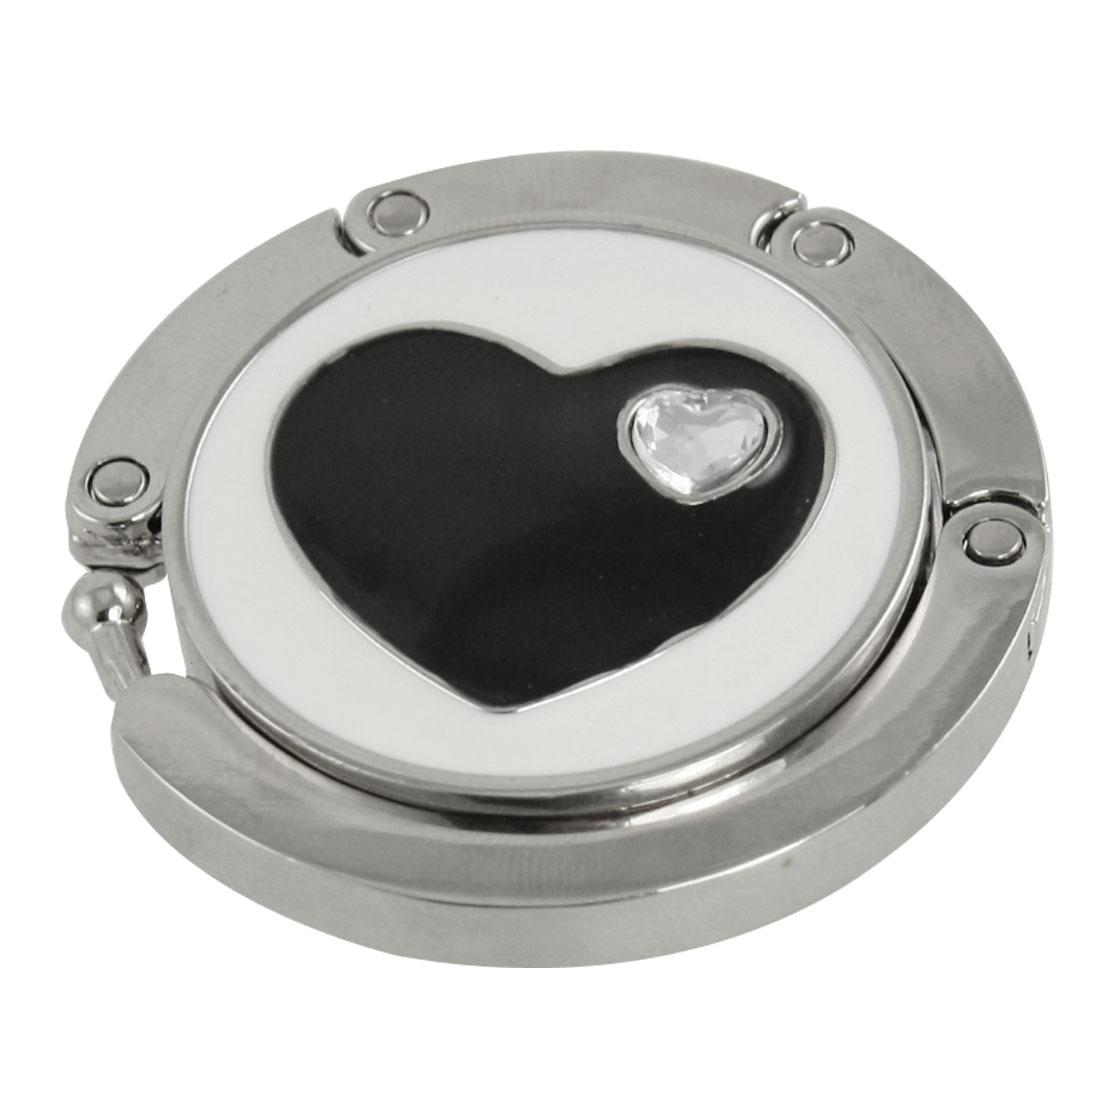 Rhinestone Accent Black Heart White Silver Tone Round Handbag Hook